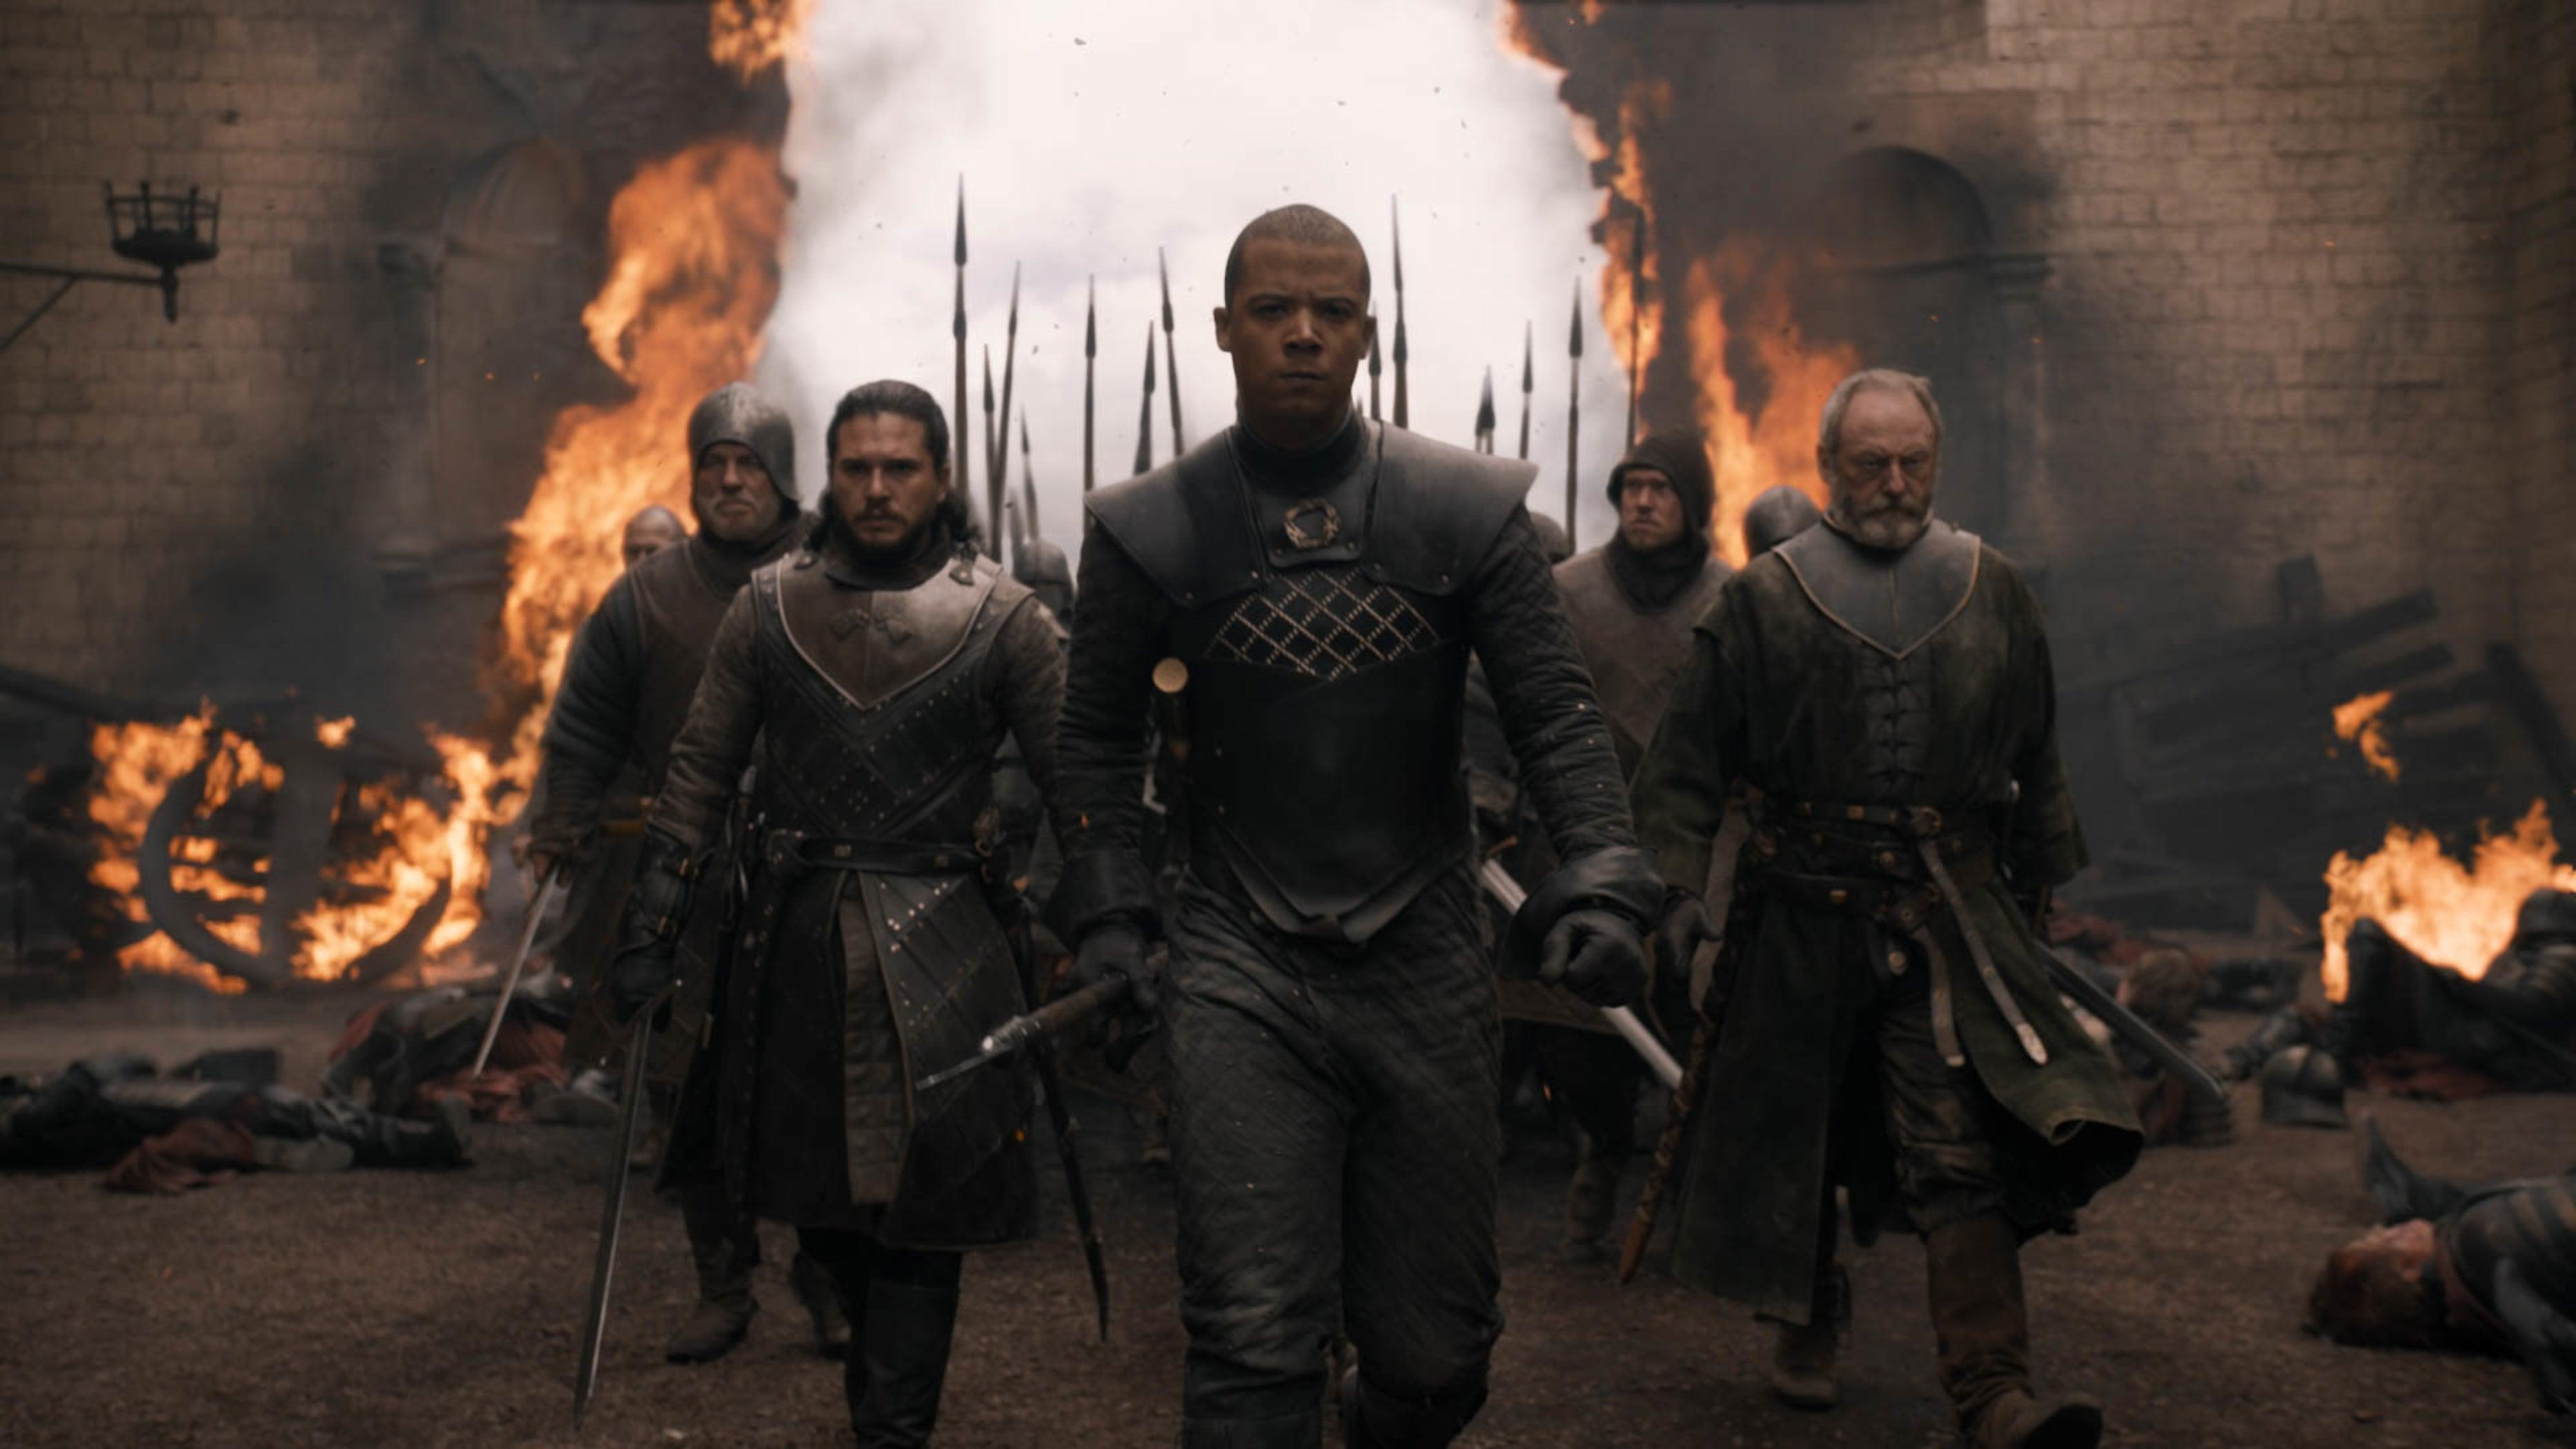 Jon Snow and friends striding through a burnt-down wall.